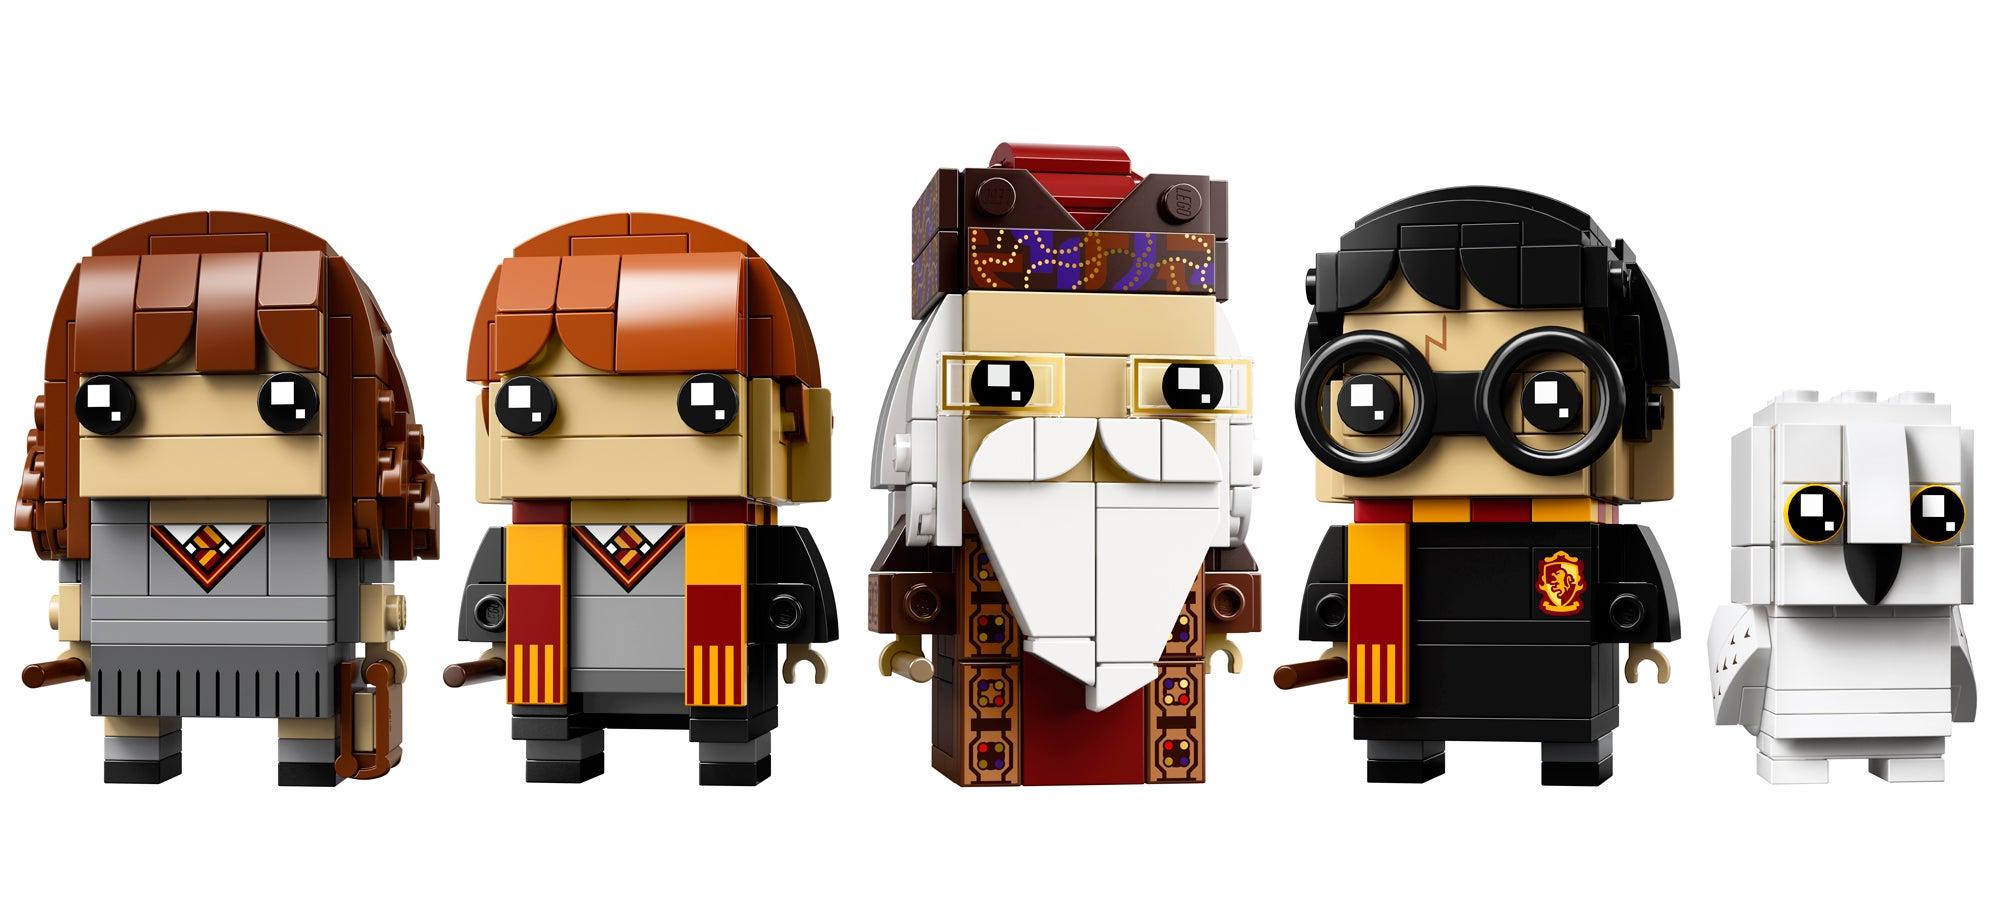 Brickheadz You Harry Lego's Going Are Kedavra To Avada With Potter JFKTlc31